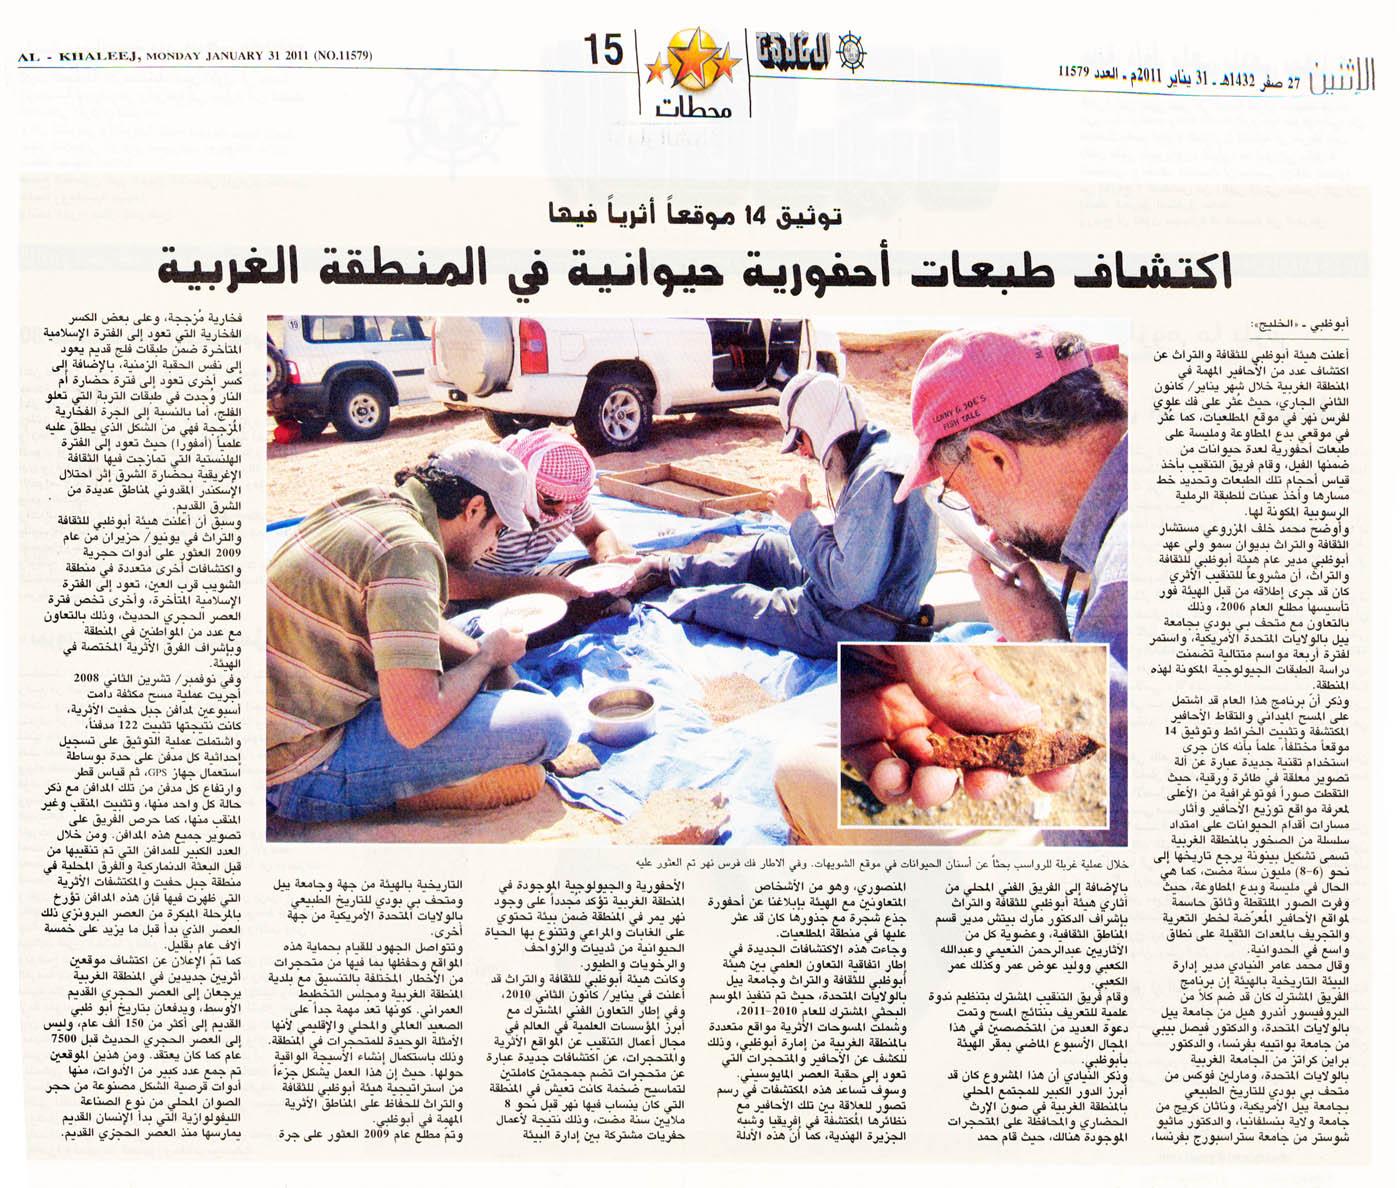 Al Khaleej (arabic) 11 November 2010, page 15